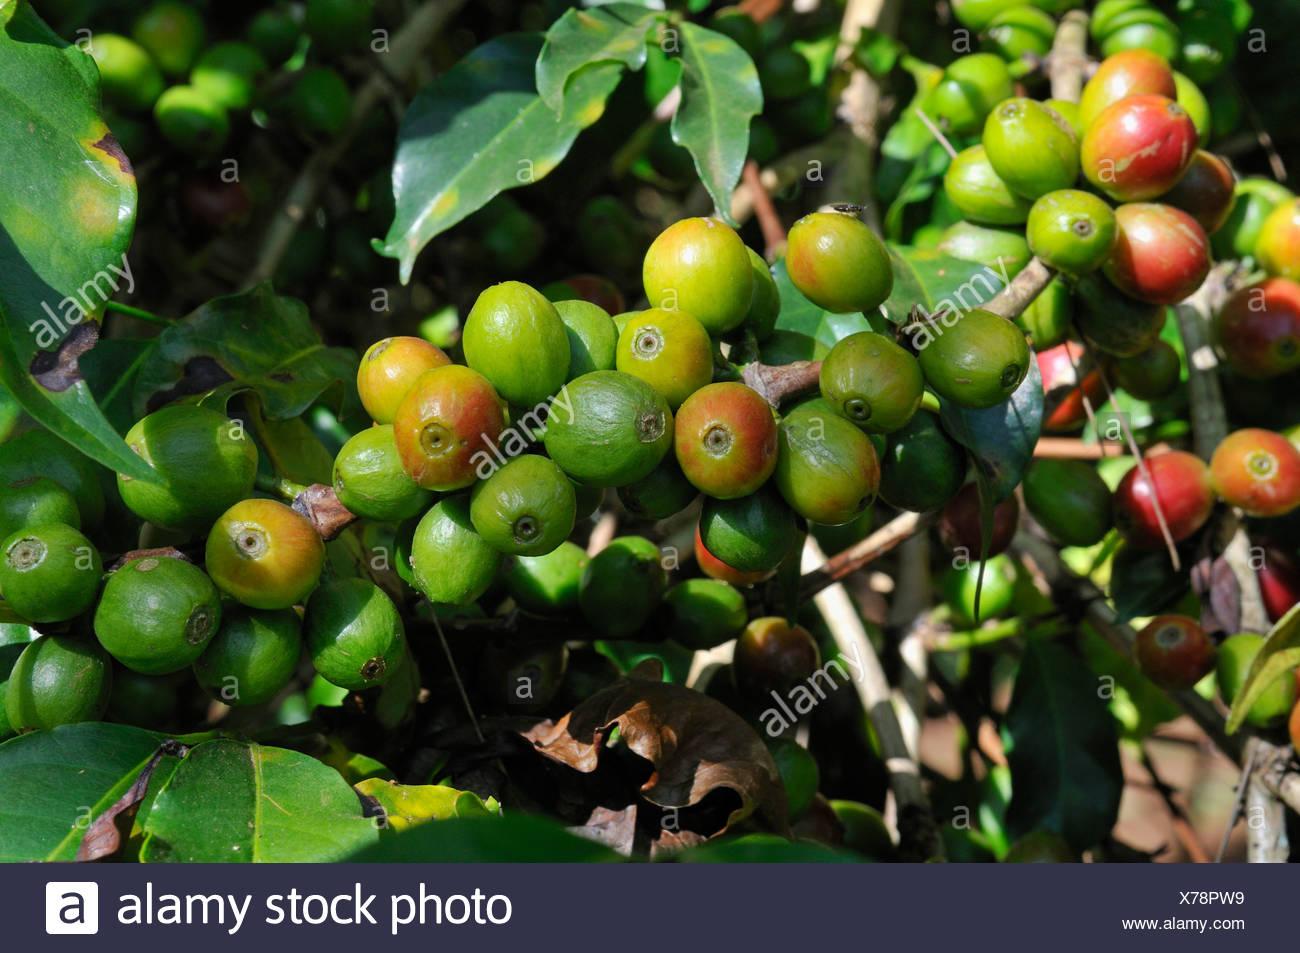 Ripe and unripe coffee berries growing on a tree, Jimma, Kaffa Region, Oromiya, Ethiopia, Africa - Stock Image